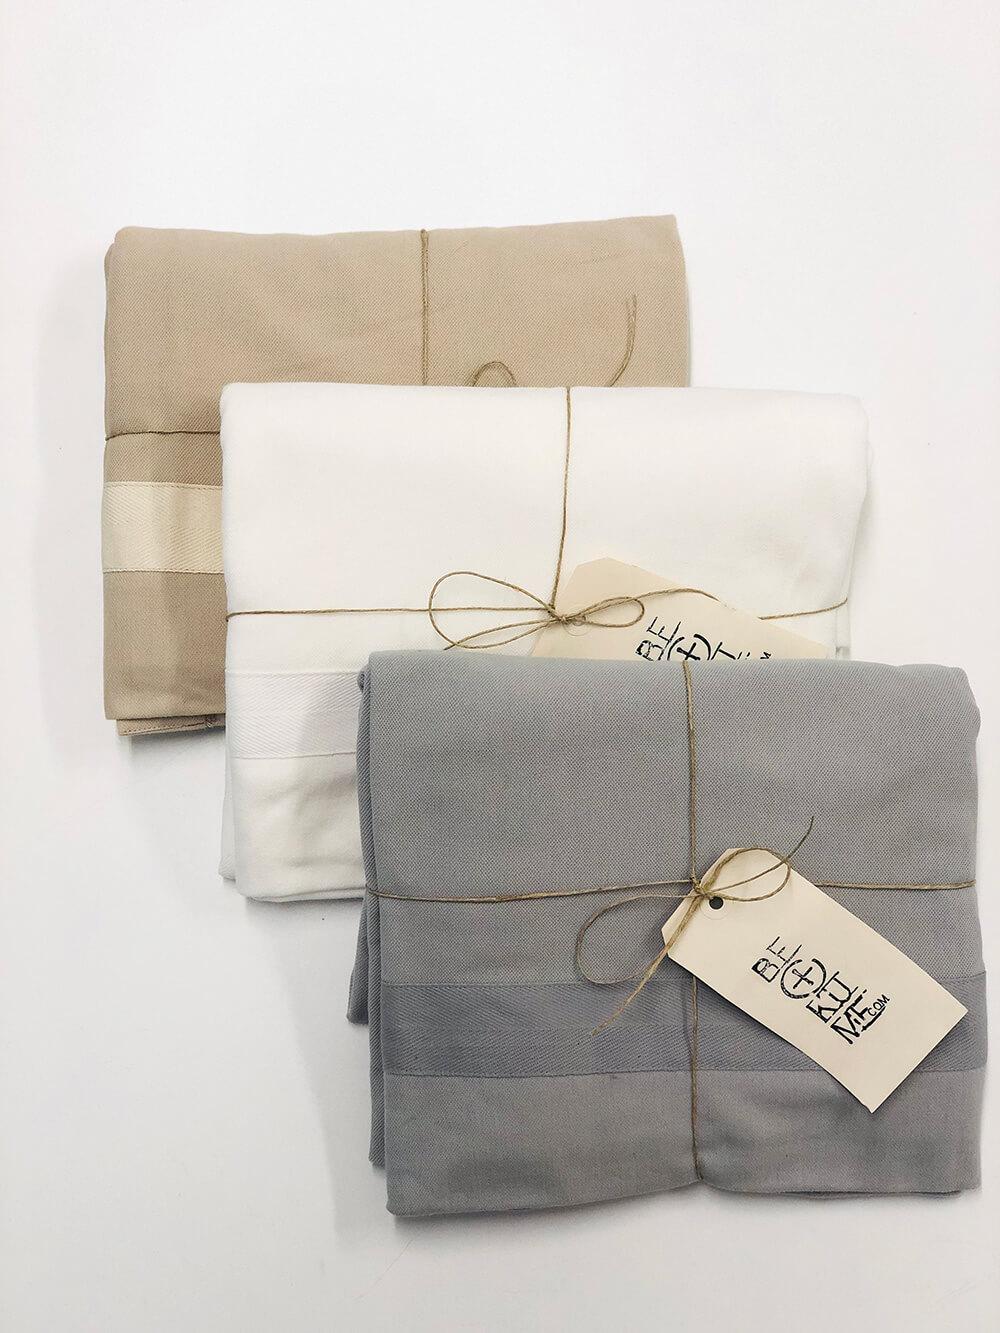 tolla-cinta-10-blanco-silueta-solo